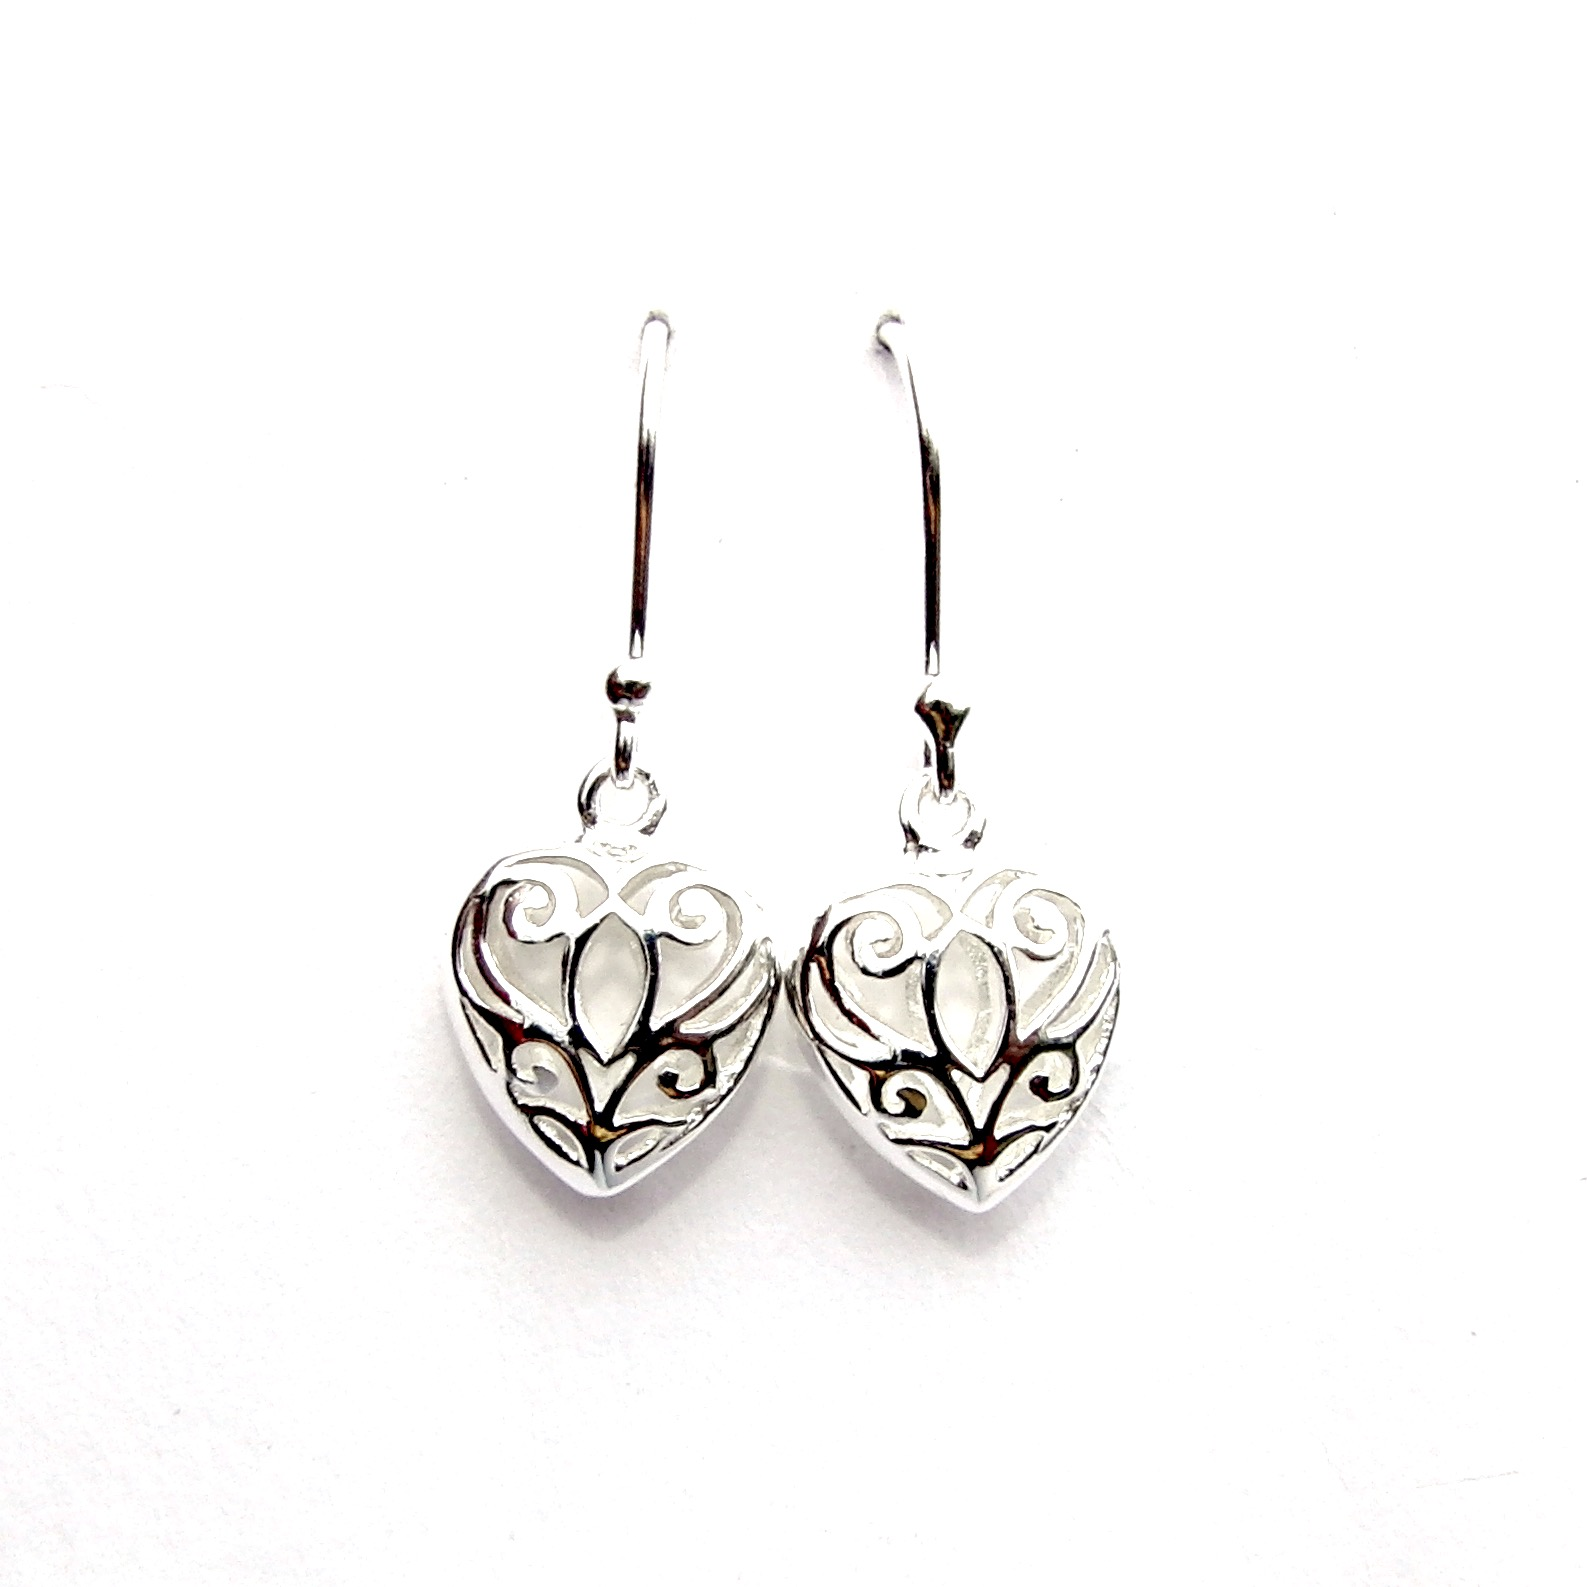 Filigree Puff Heart Earrings